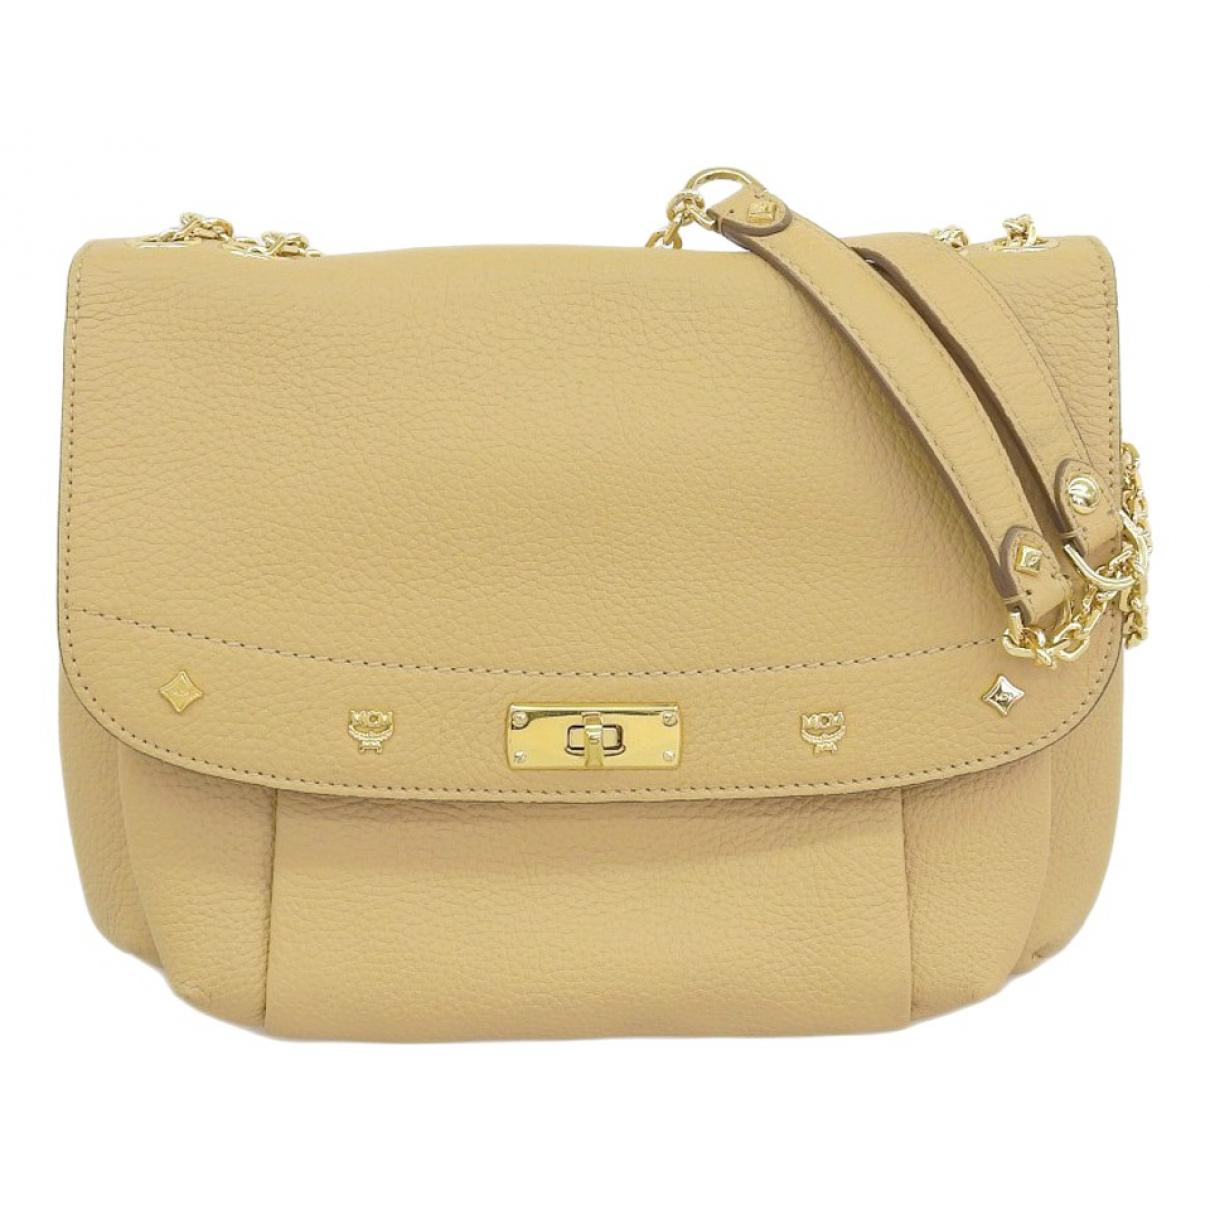 Mcm \N Beige Cloth handbag for Women \N